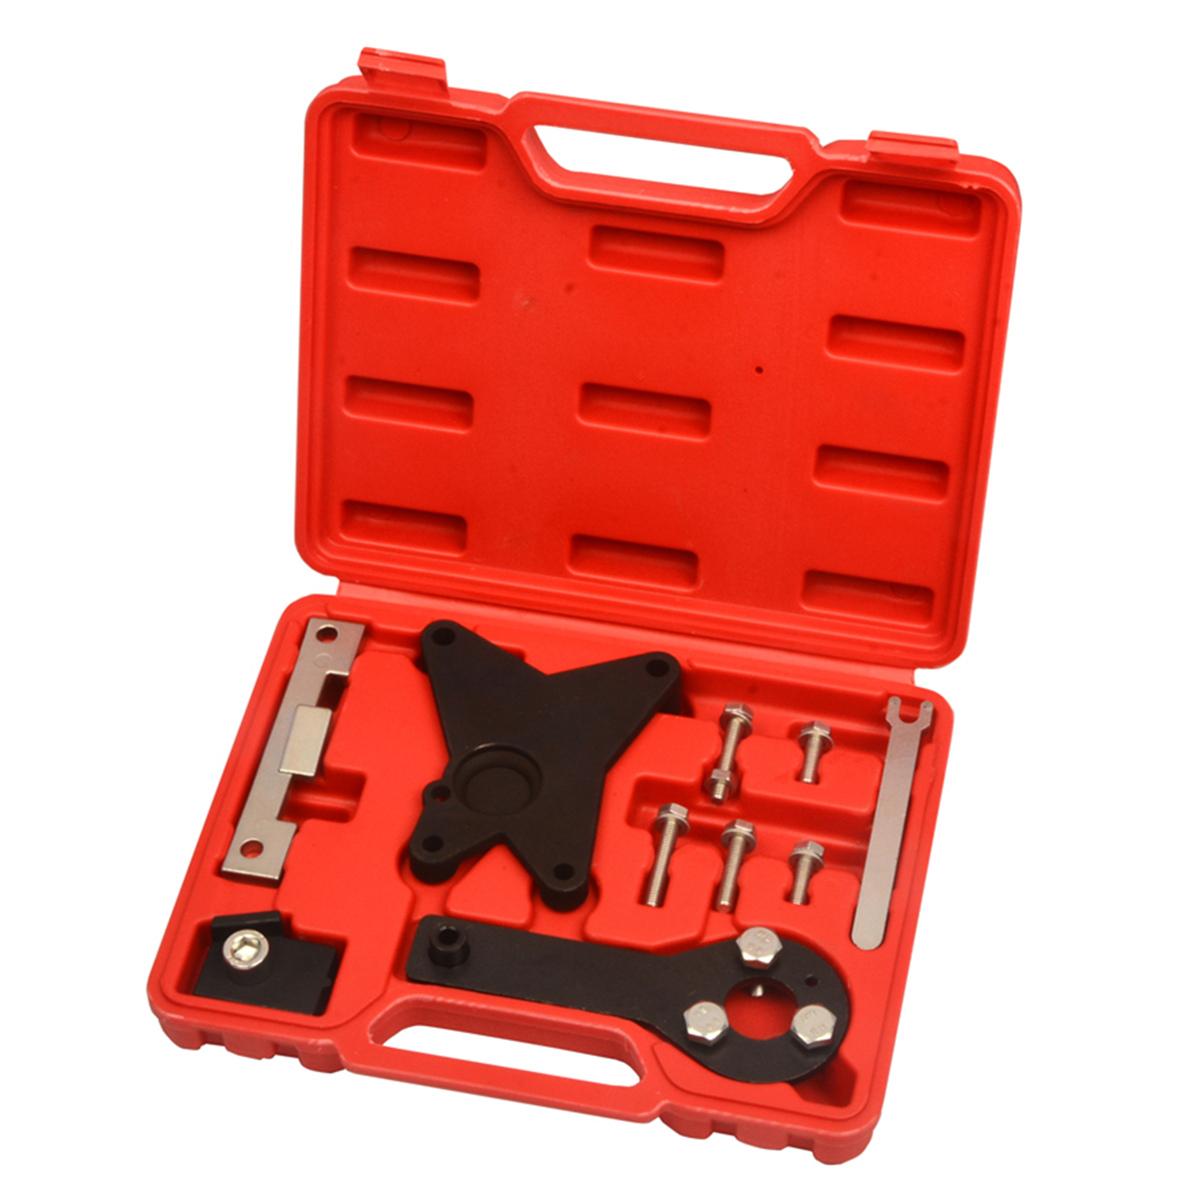 Fiat /Ford Outil Distribution Moteur 1.2 1.4 Vvt Panda 500 Doblo Idea 04-12 Narzędzia i sprzęt warsztatowy